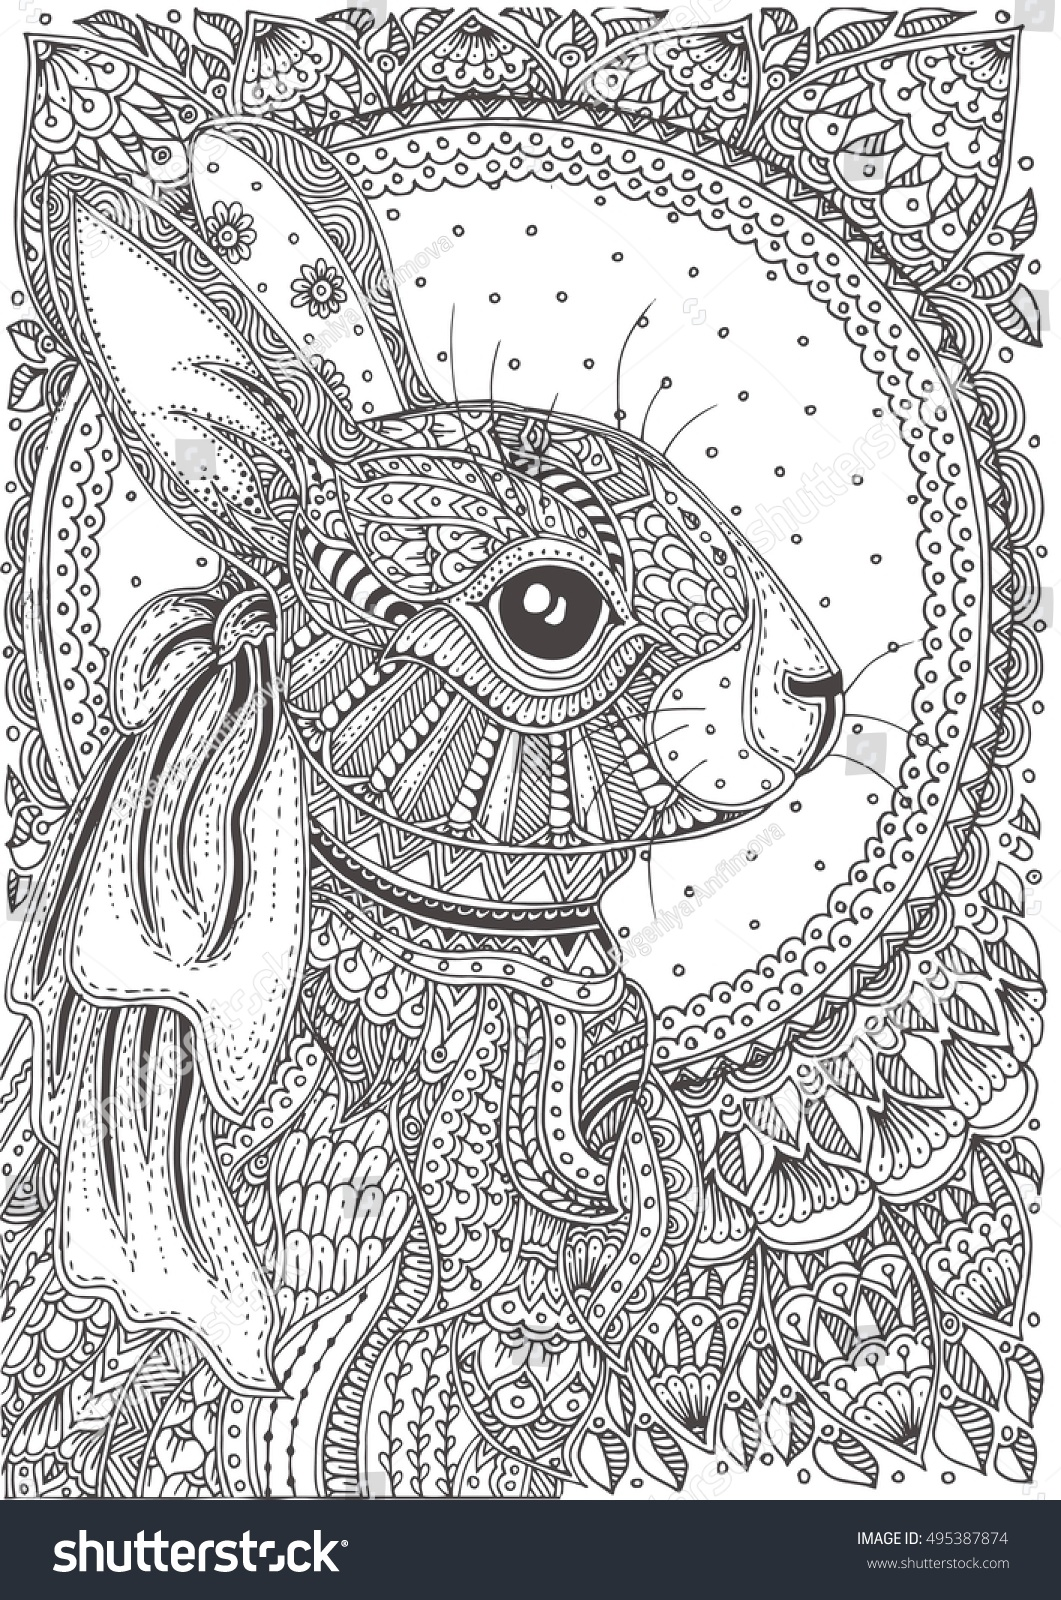 Handdrawn Rabbit Ethnic Floral Doodle Pattern Stock Vector